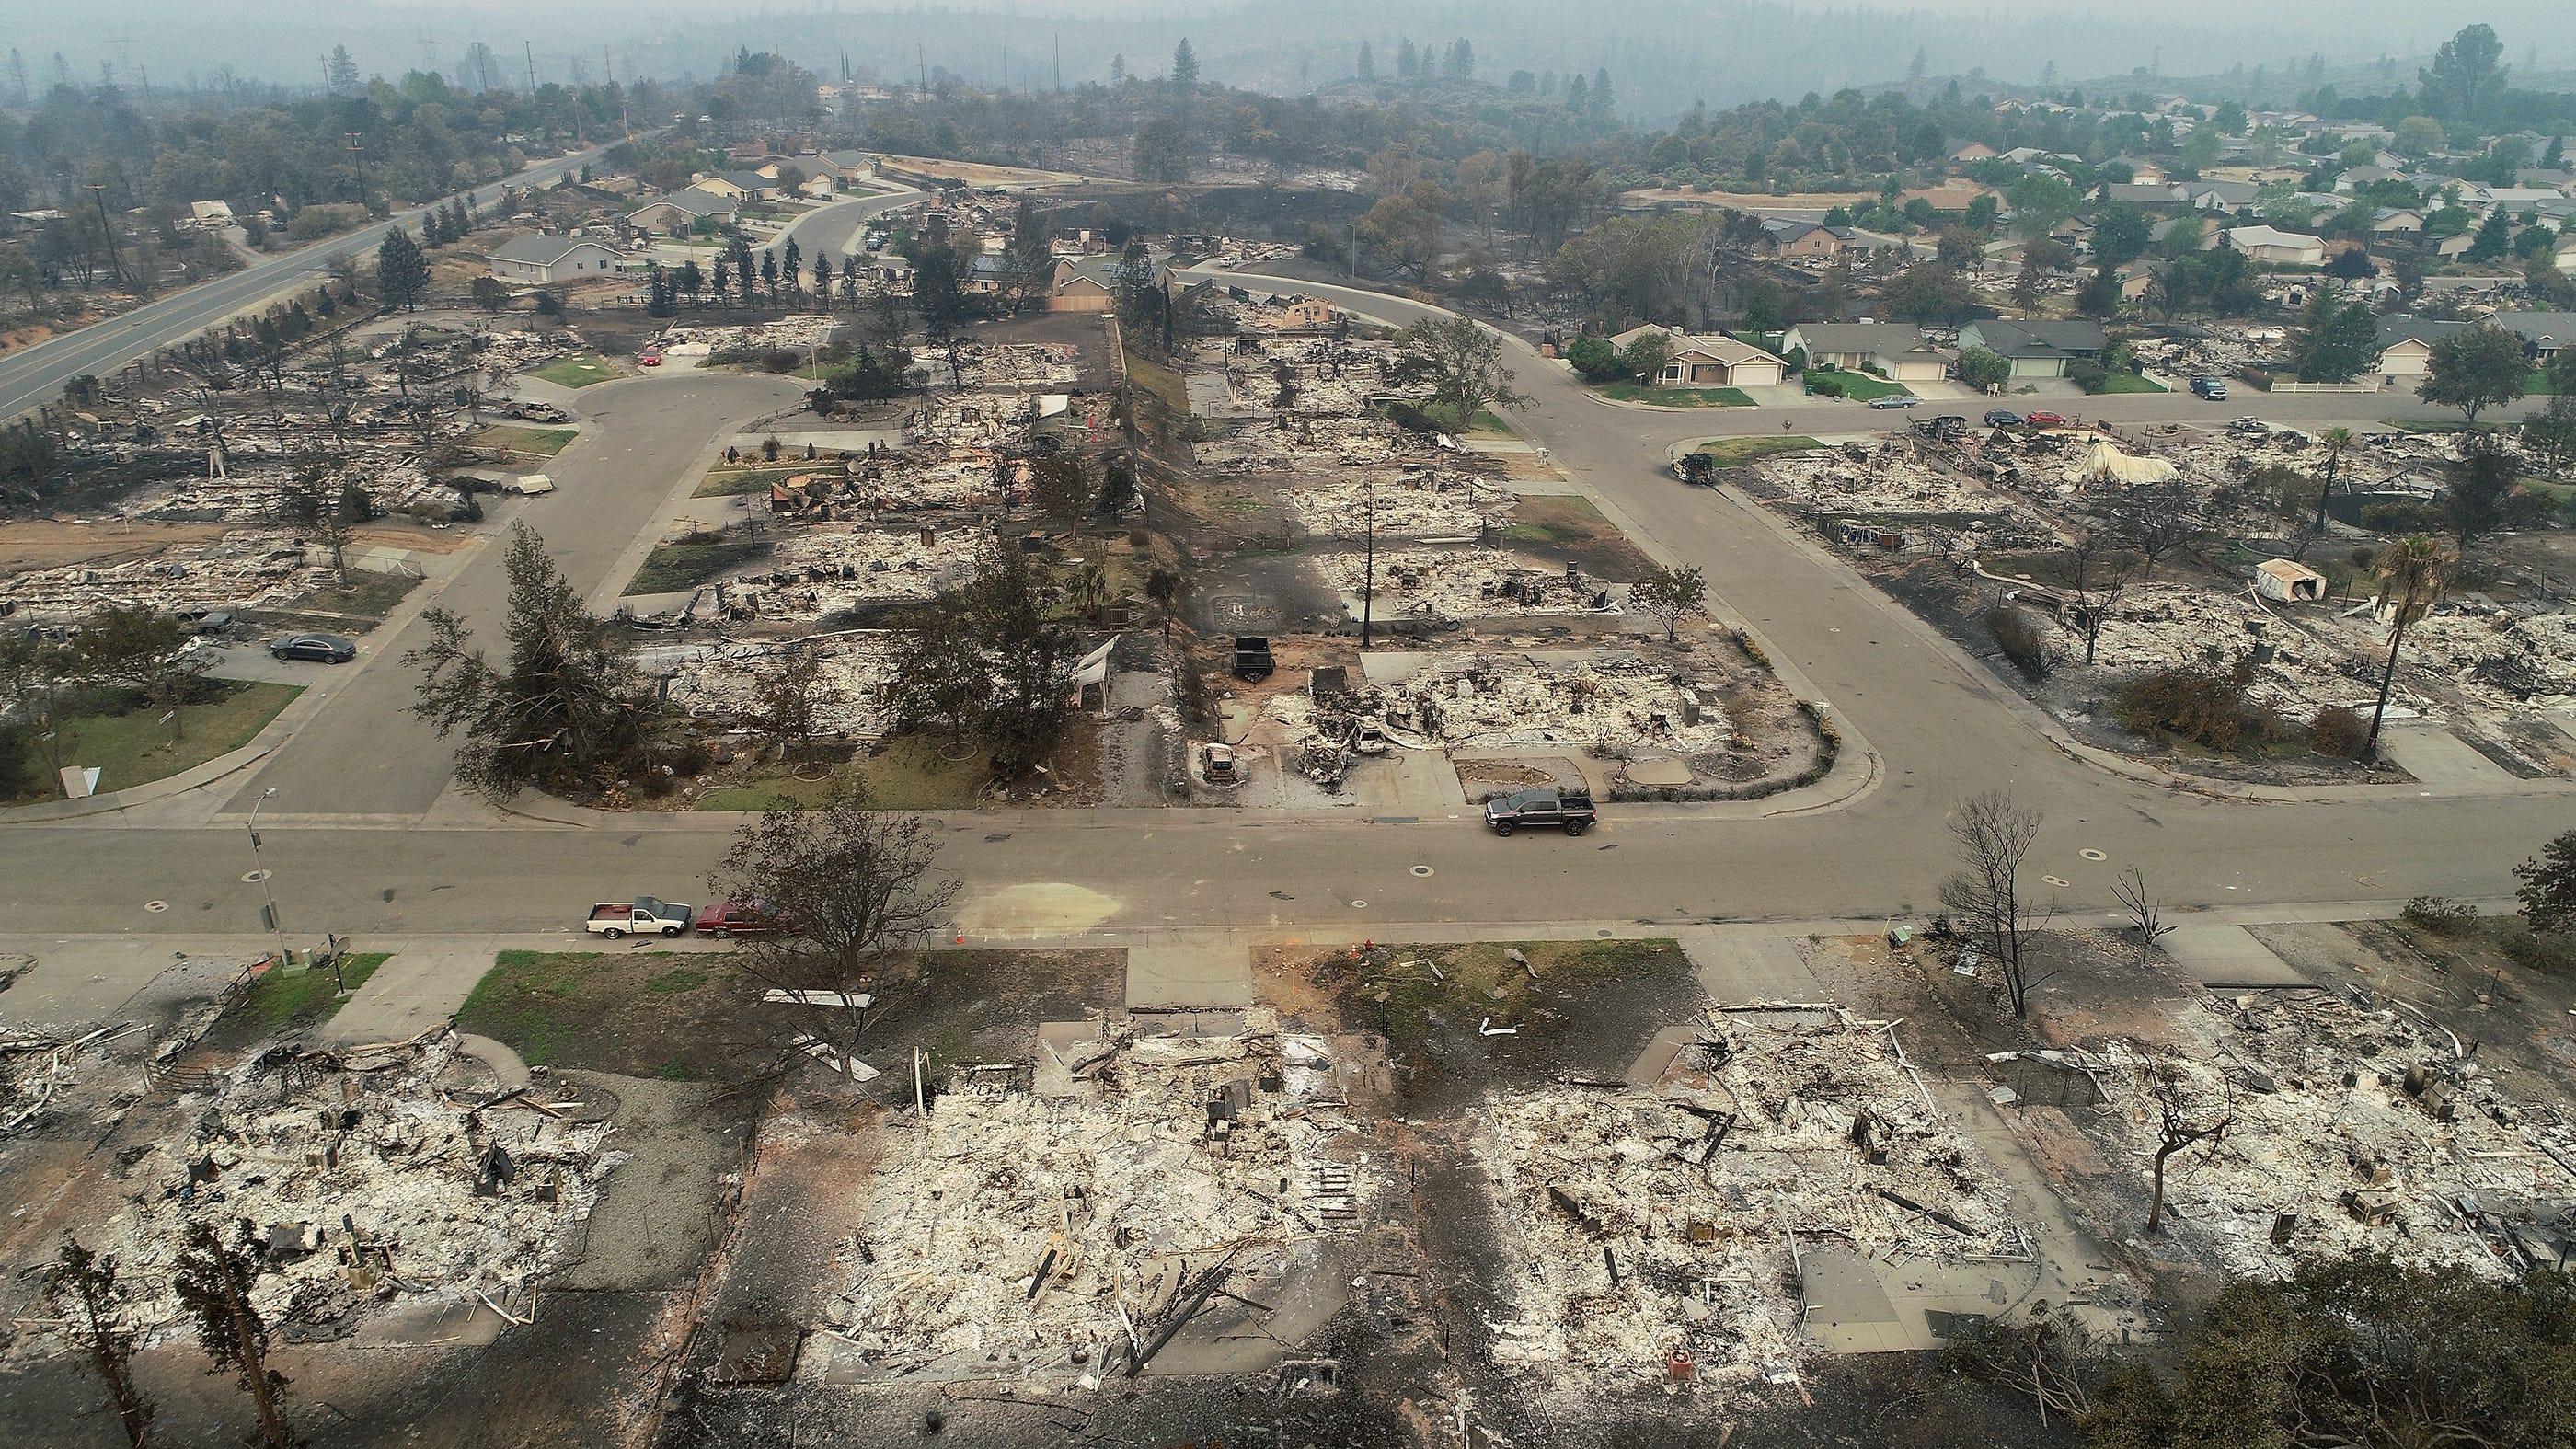 A view of the Lake Keswick Estates neighborhood on the northwest side of Redding, Calif. Aug 2, 2018.